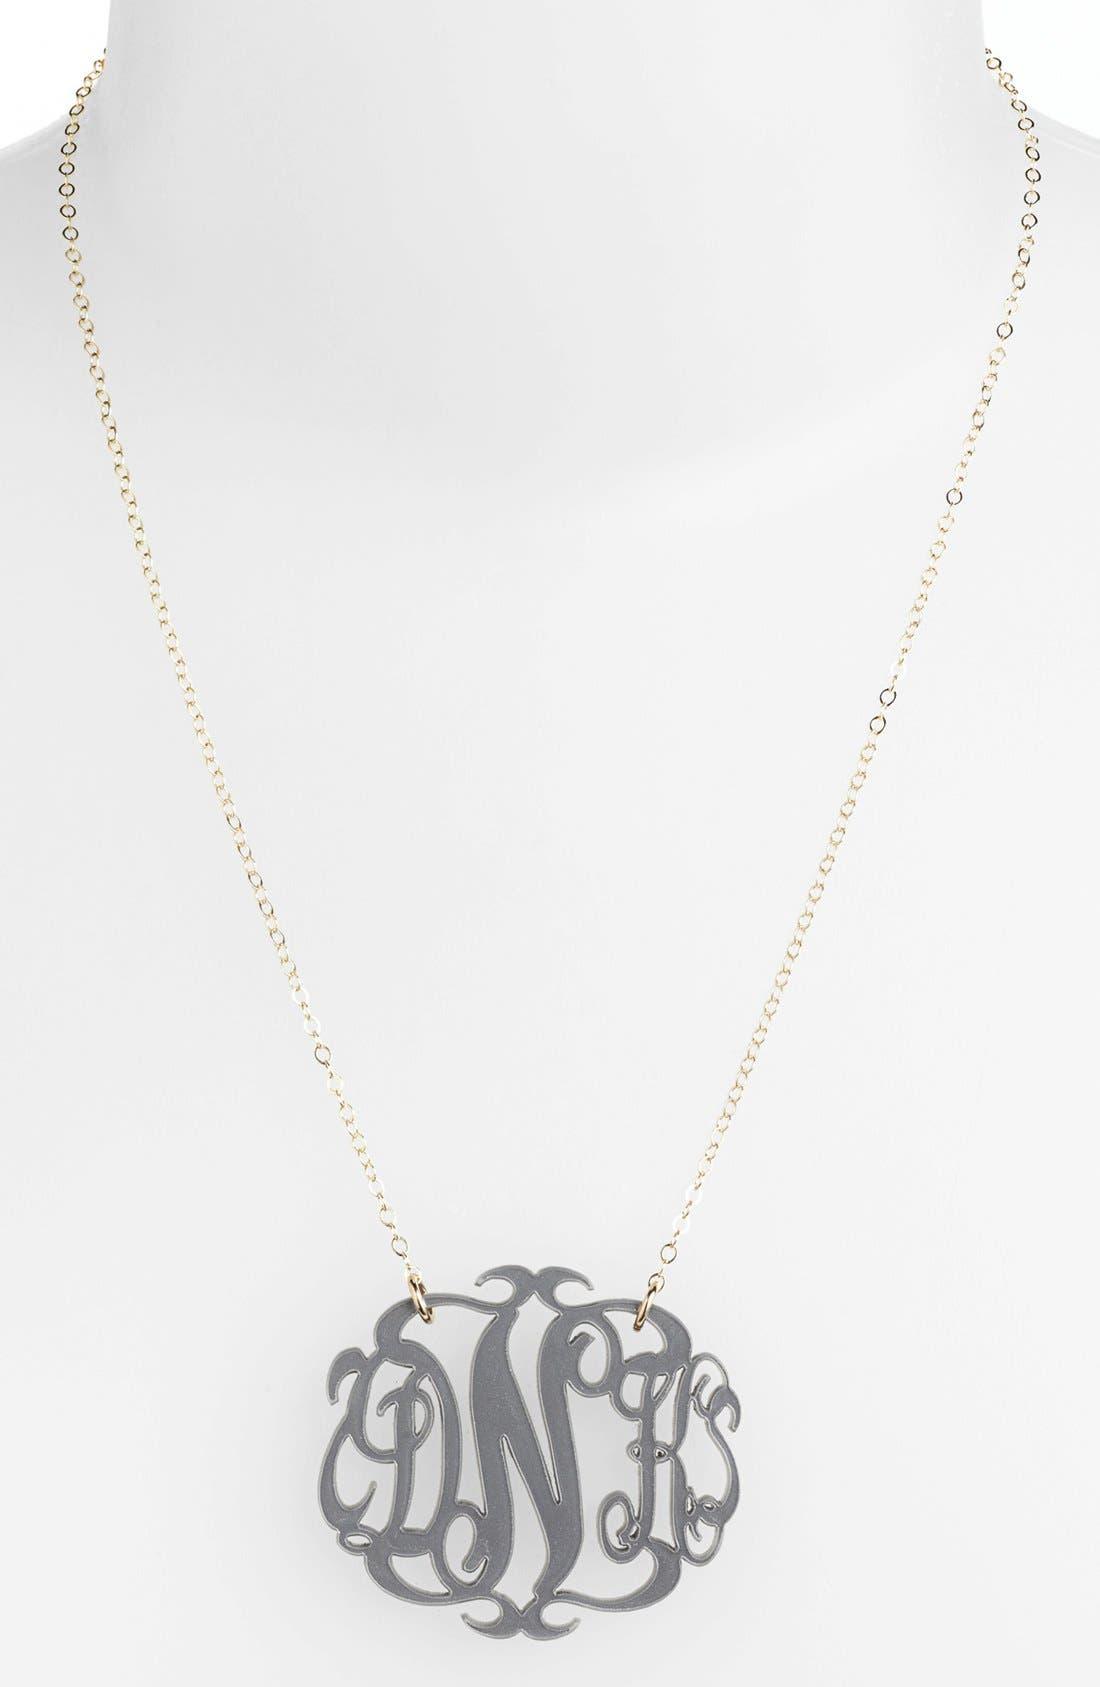 Large Oval Personalized Monogram Pendant Necklace,                             Main thumbnail 1, color,                             Gunmetal/ Gold